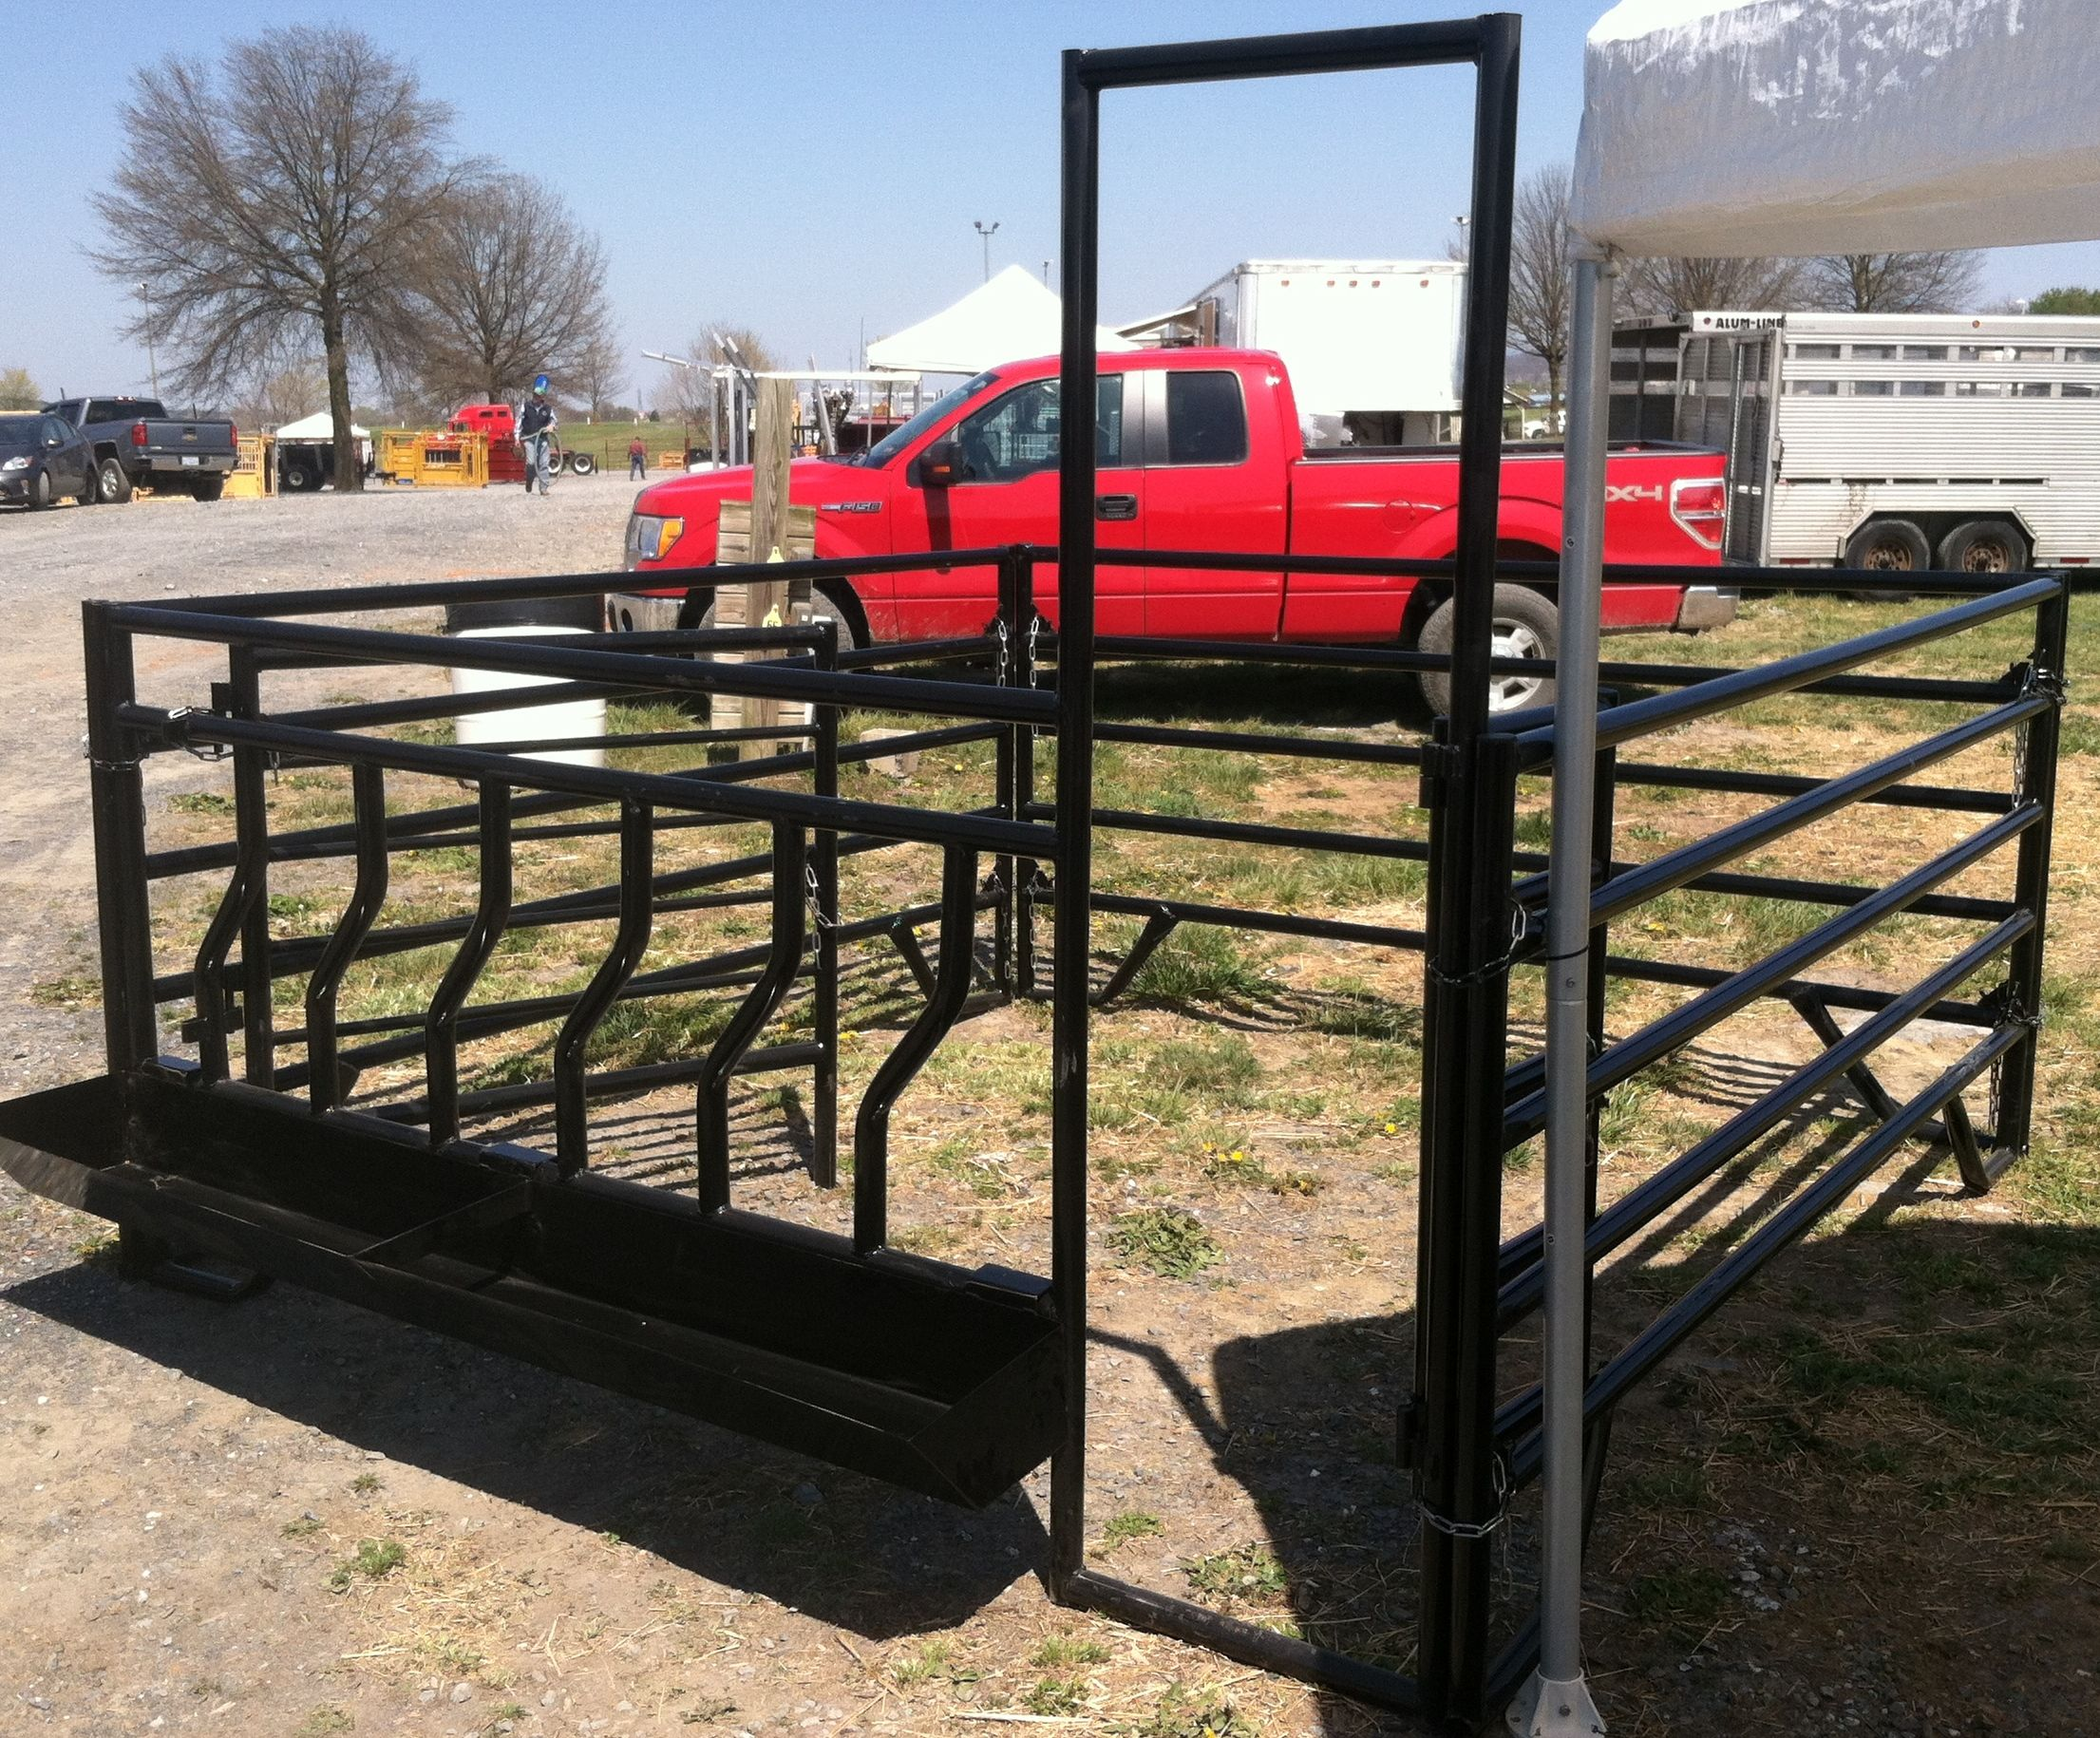 calf tarter feeders creep feeder a corral forums projects calves newly built